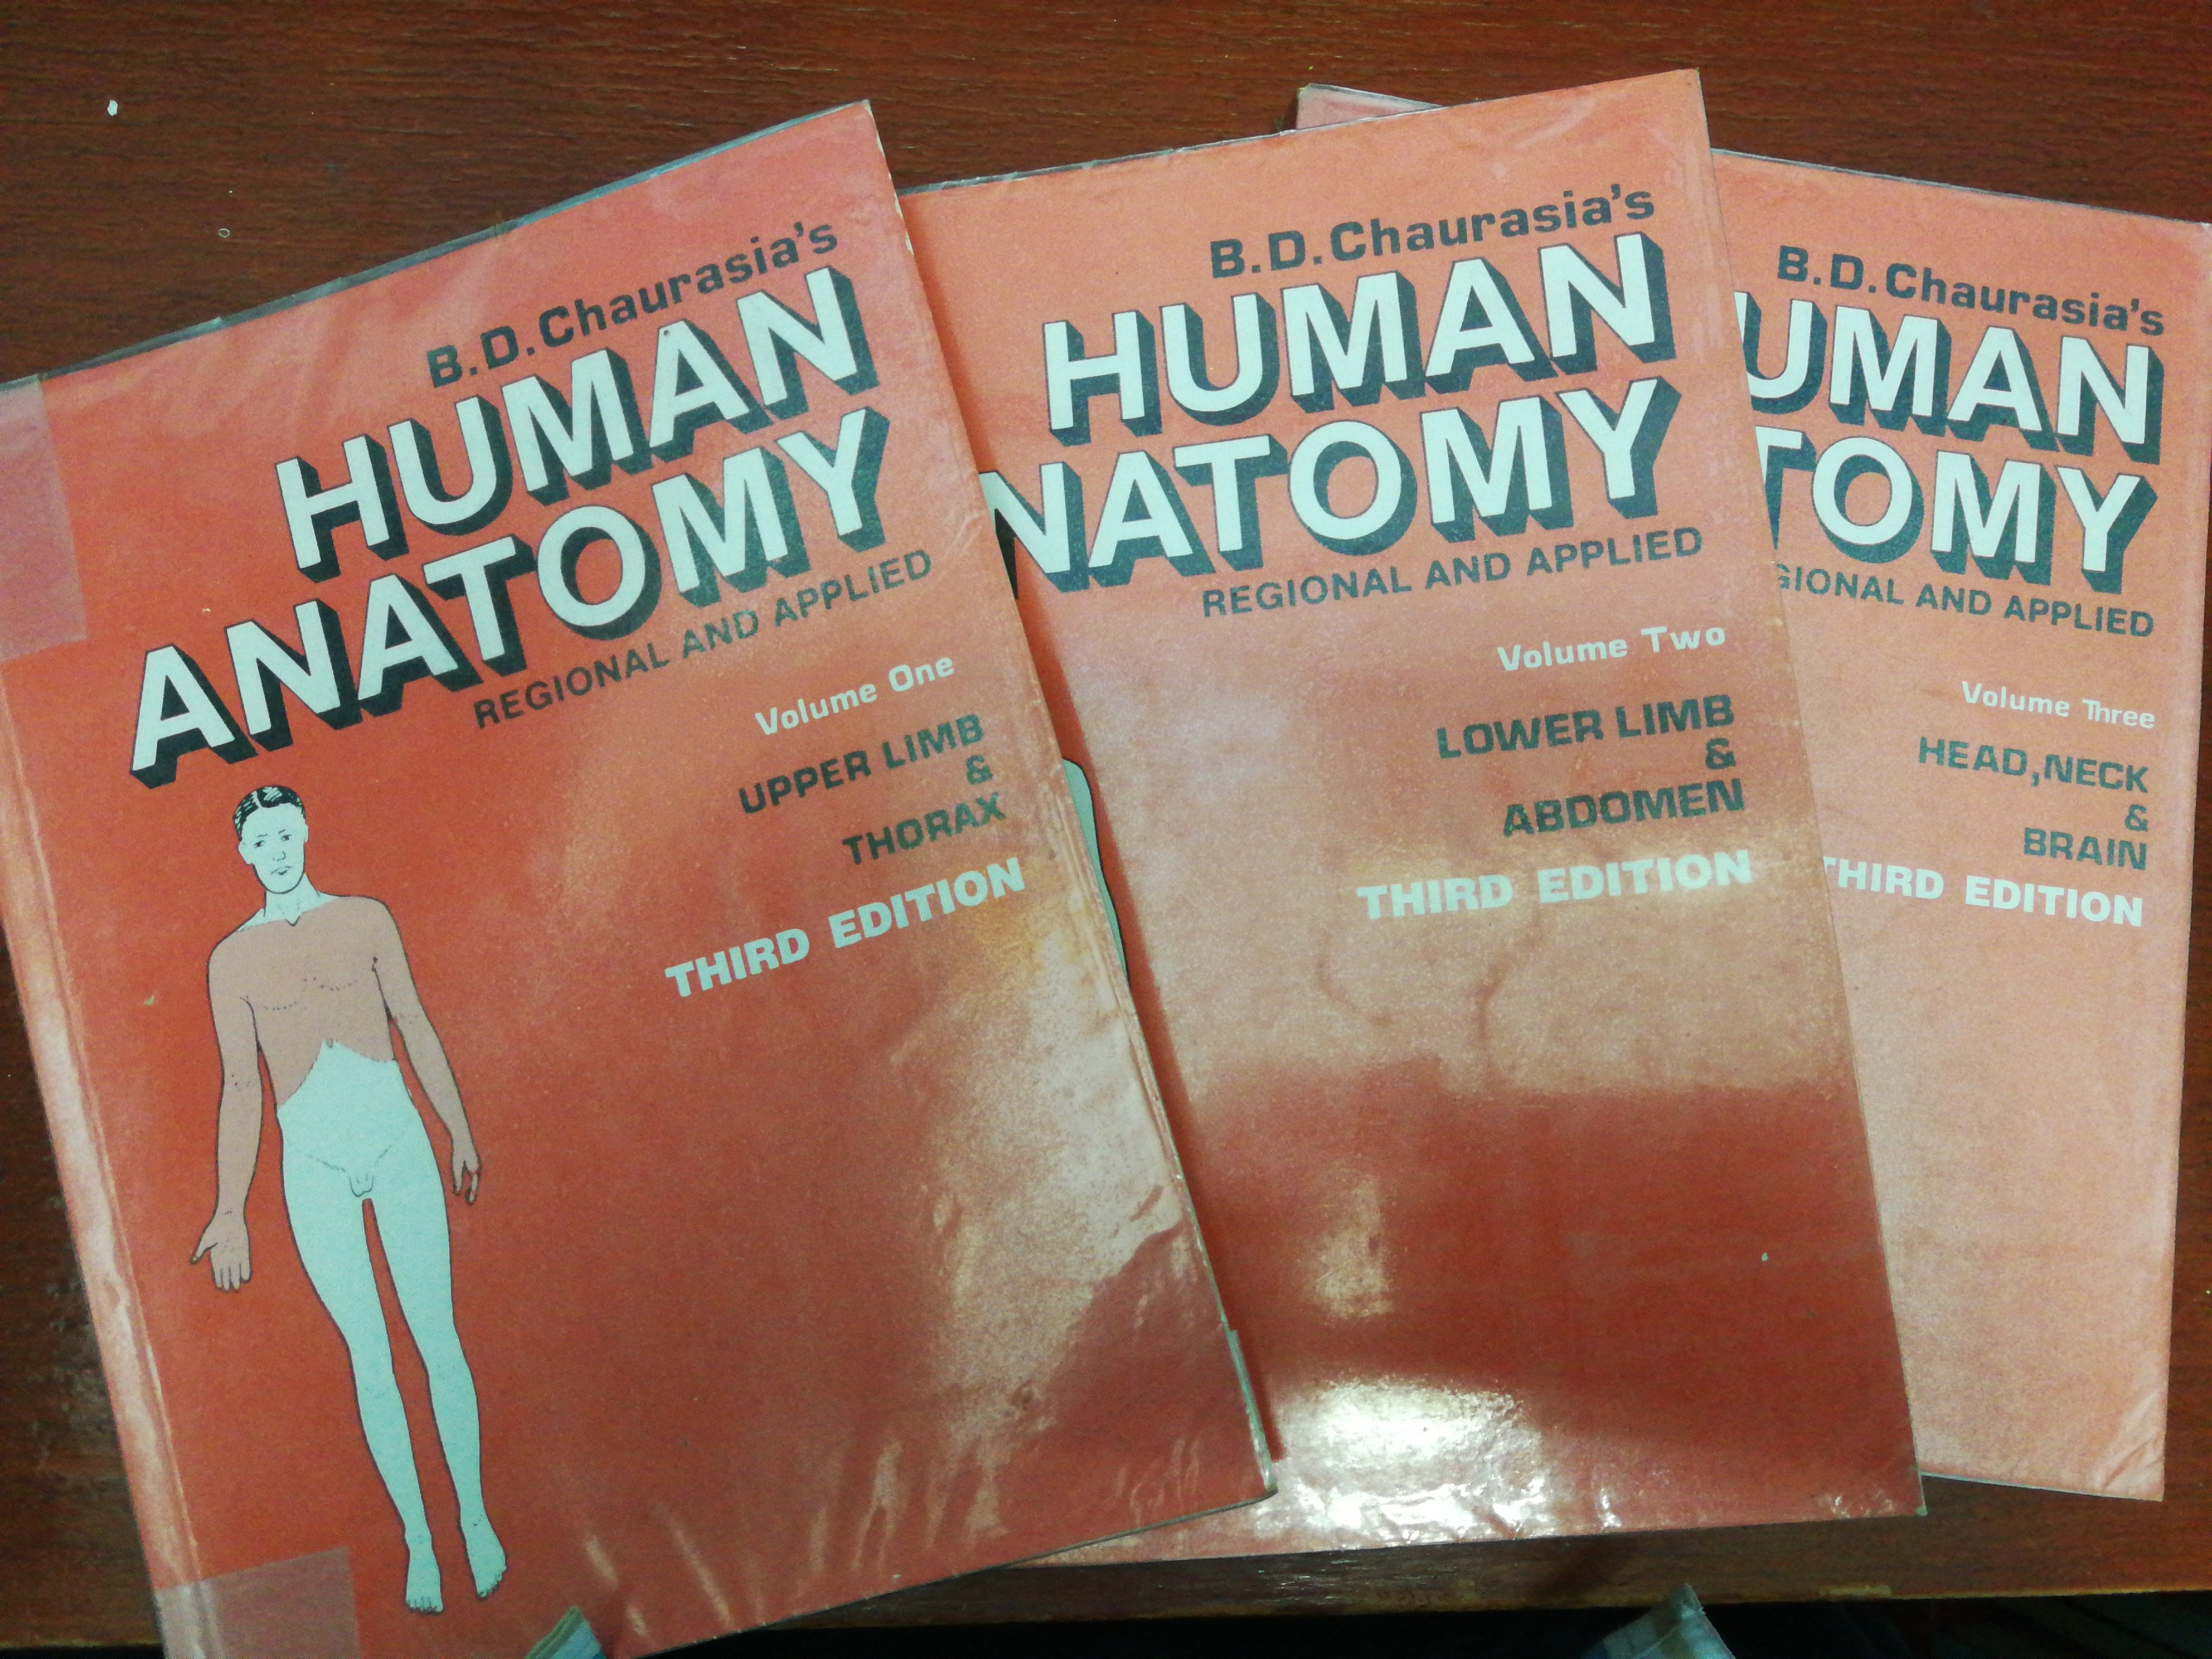 B D Chaurasias Human Anatomy Vol1 Vol3 Textbooks On Carousell